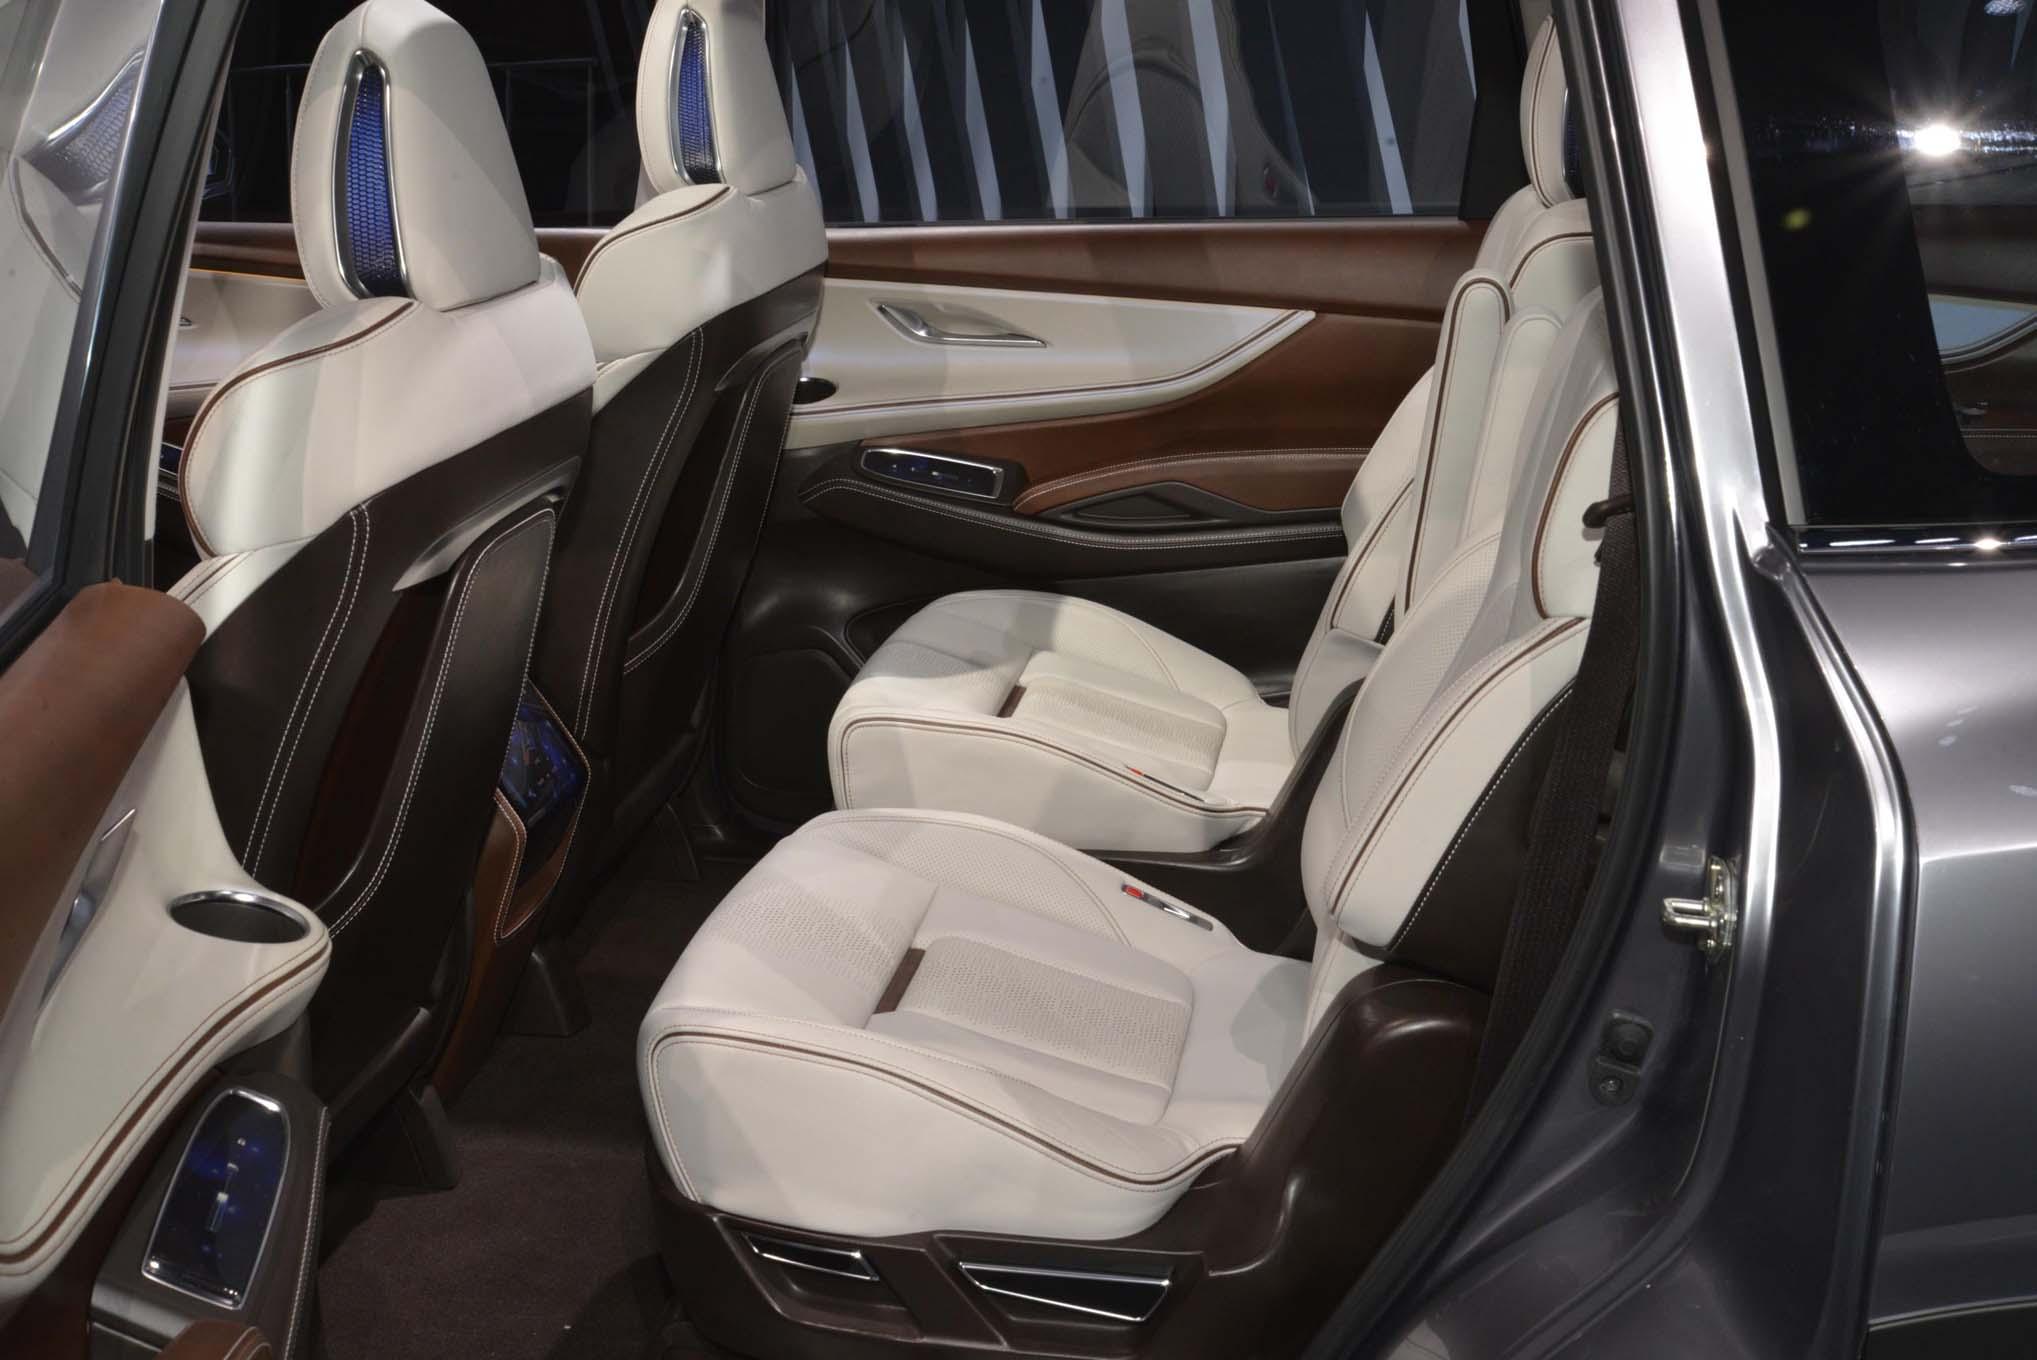 2019 Subaru Ascent Rear Interior Seats Motor Trend En